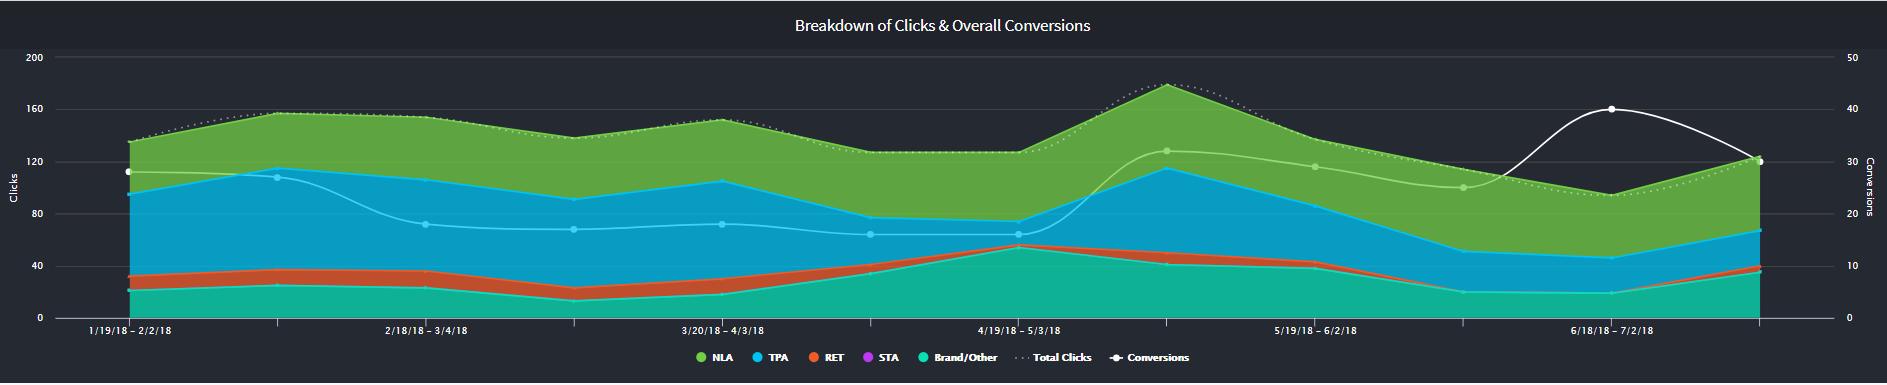 painter marketing case study conversion data